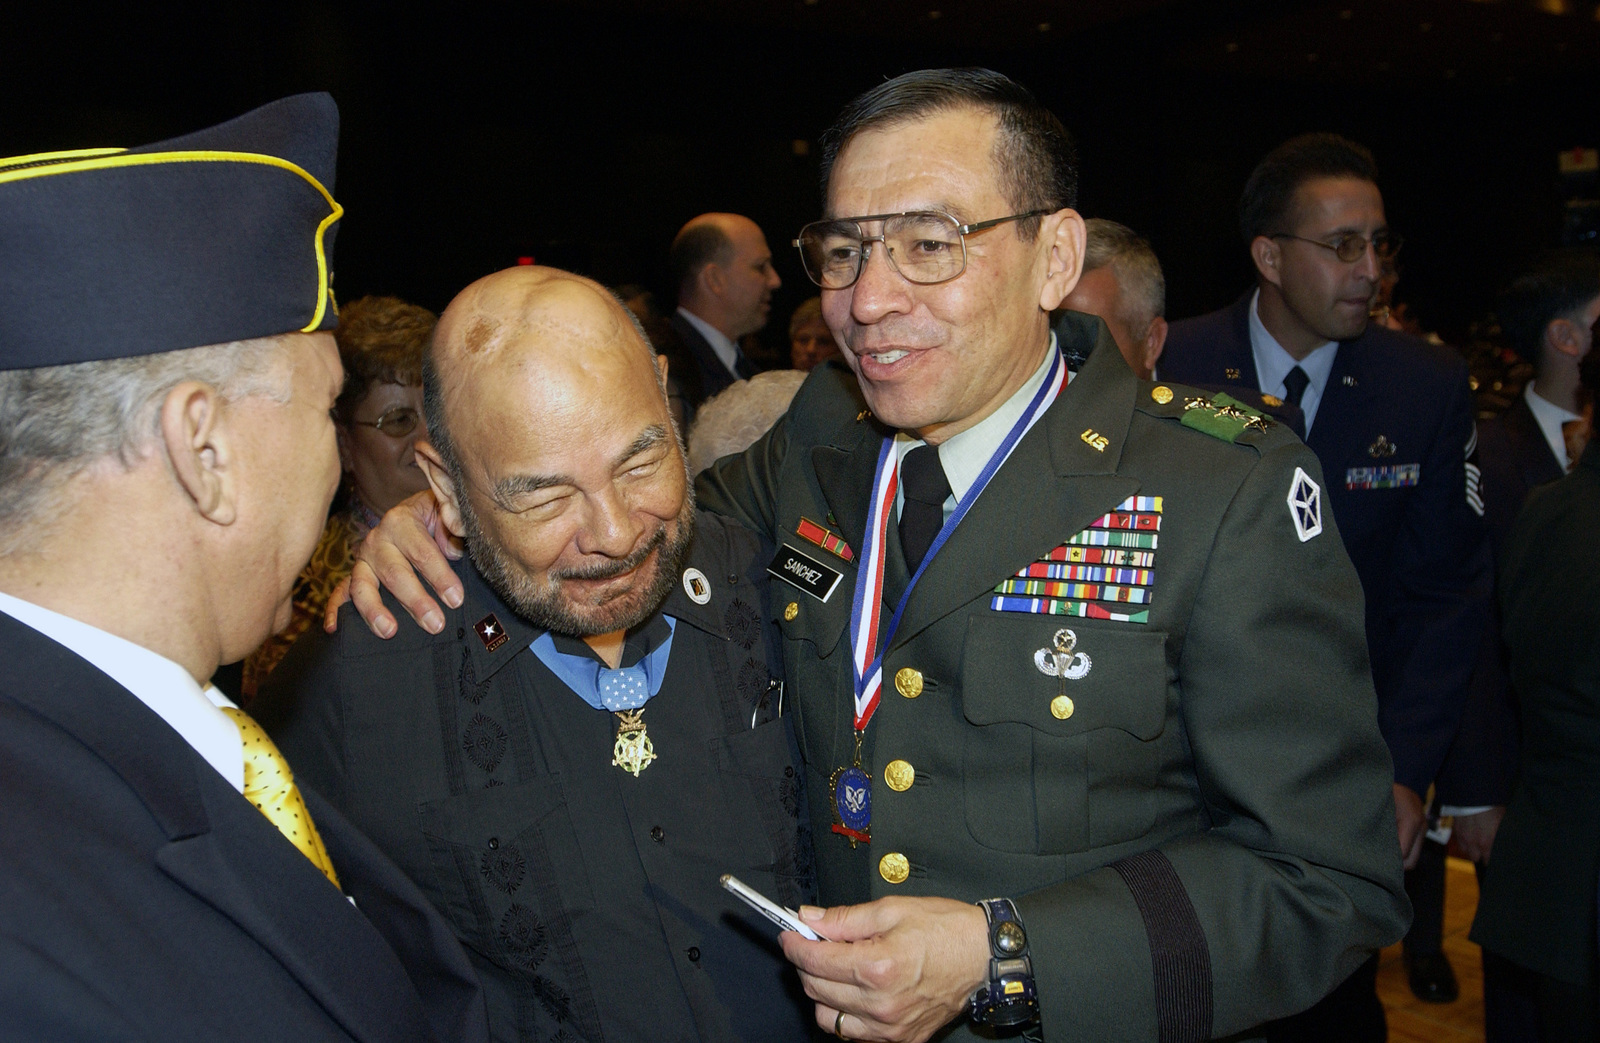 US Army (USA) Lieutenant General (LGEN) Richardo Sanchez